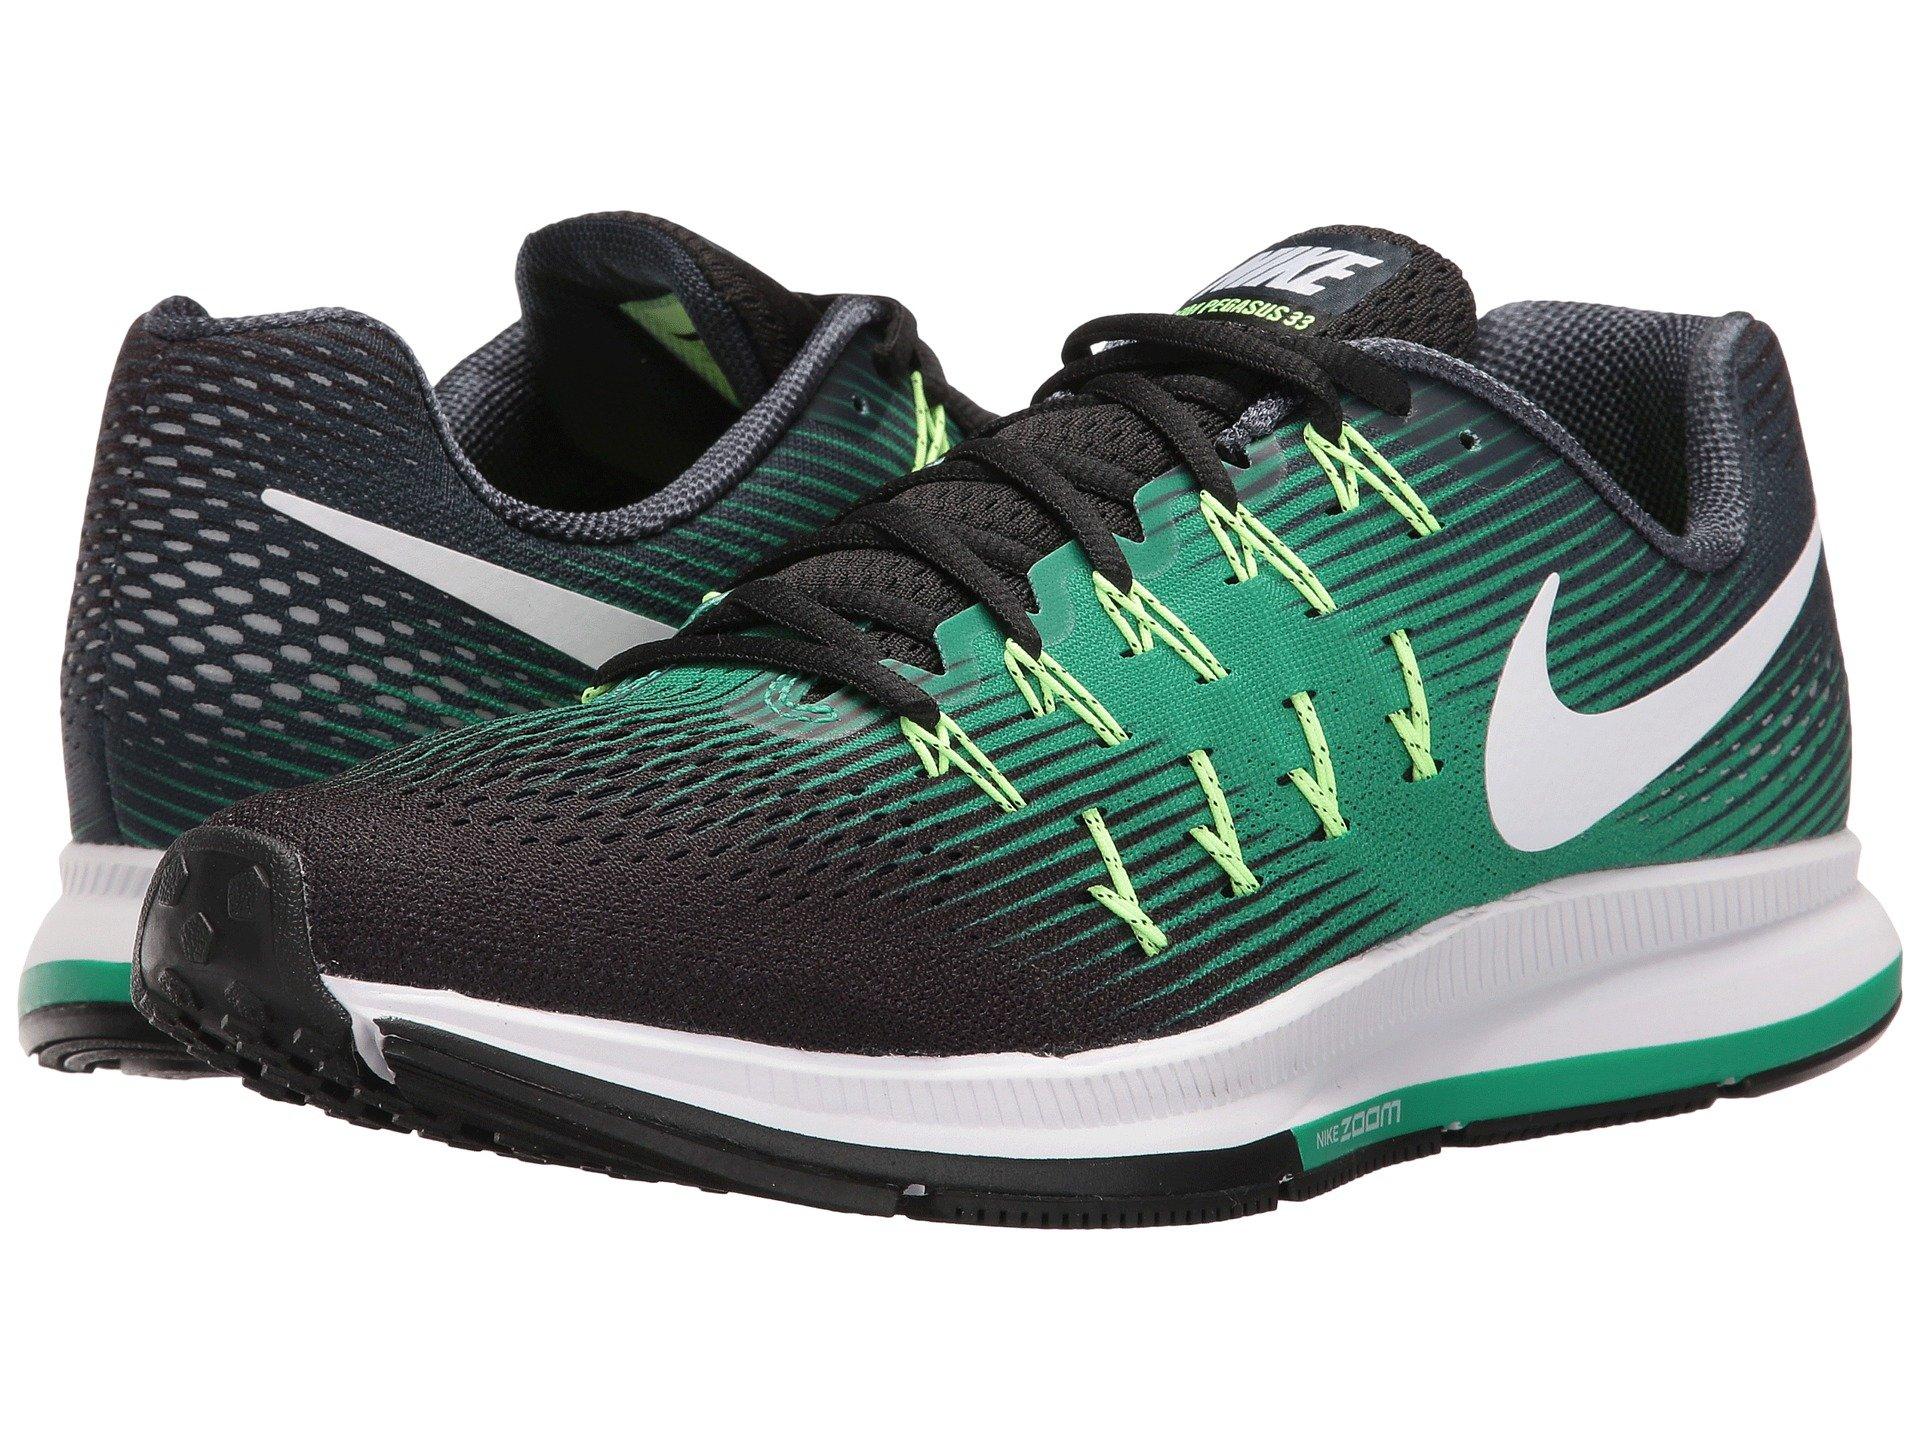 newest 6920d 08702 Nike Air Zoom Pegasus 33 In Armory Navy White Black Stadium Green